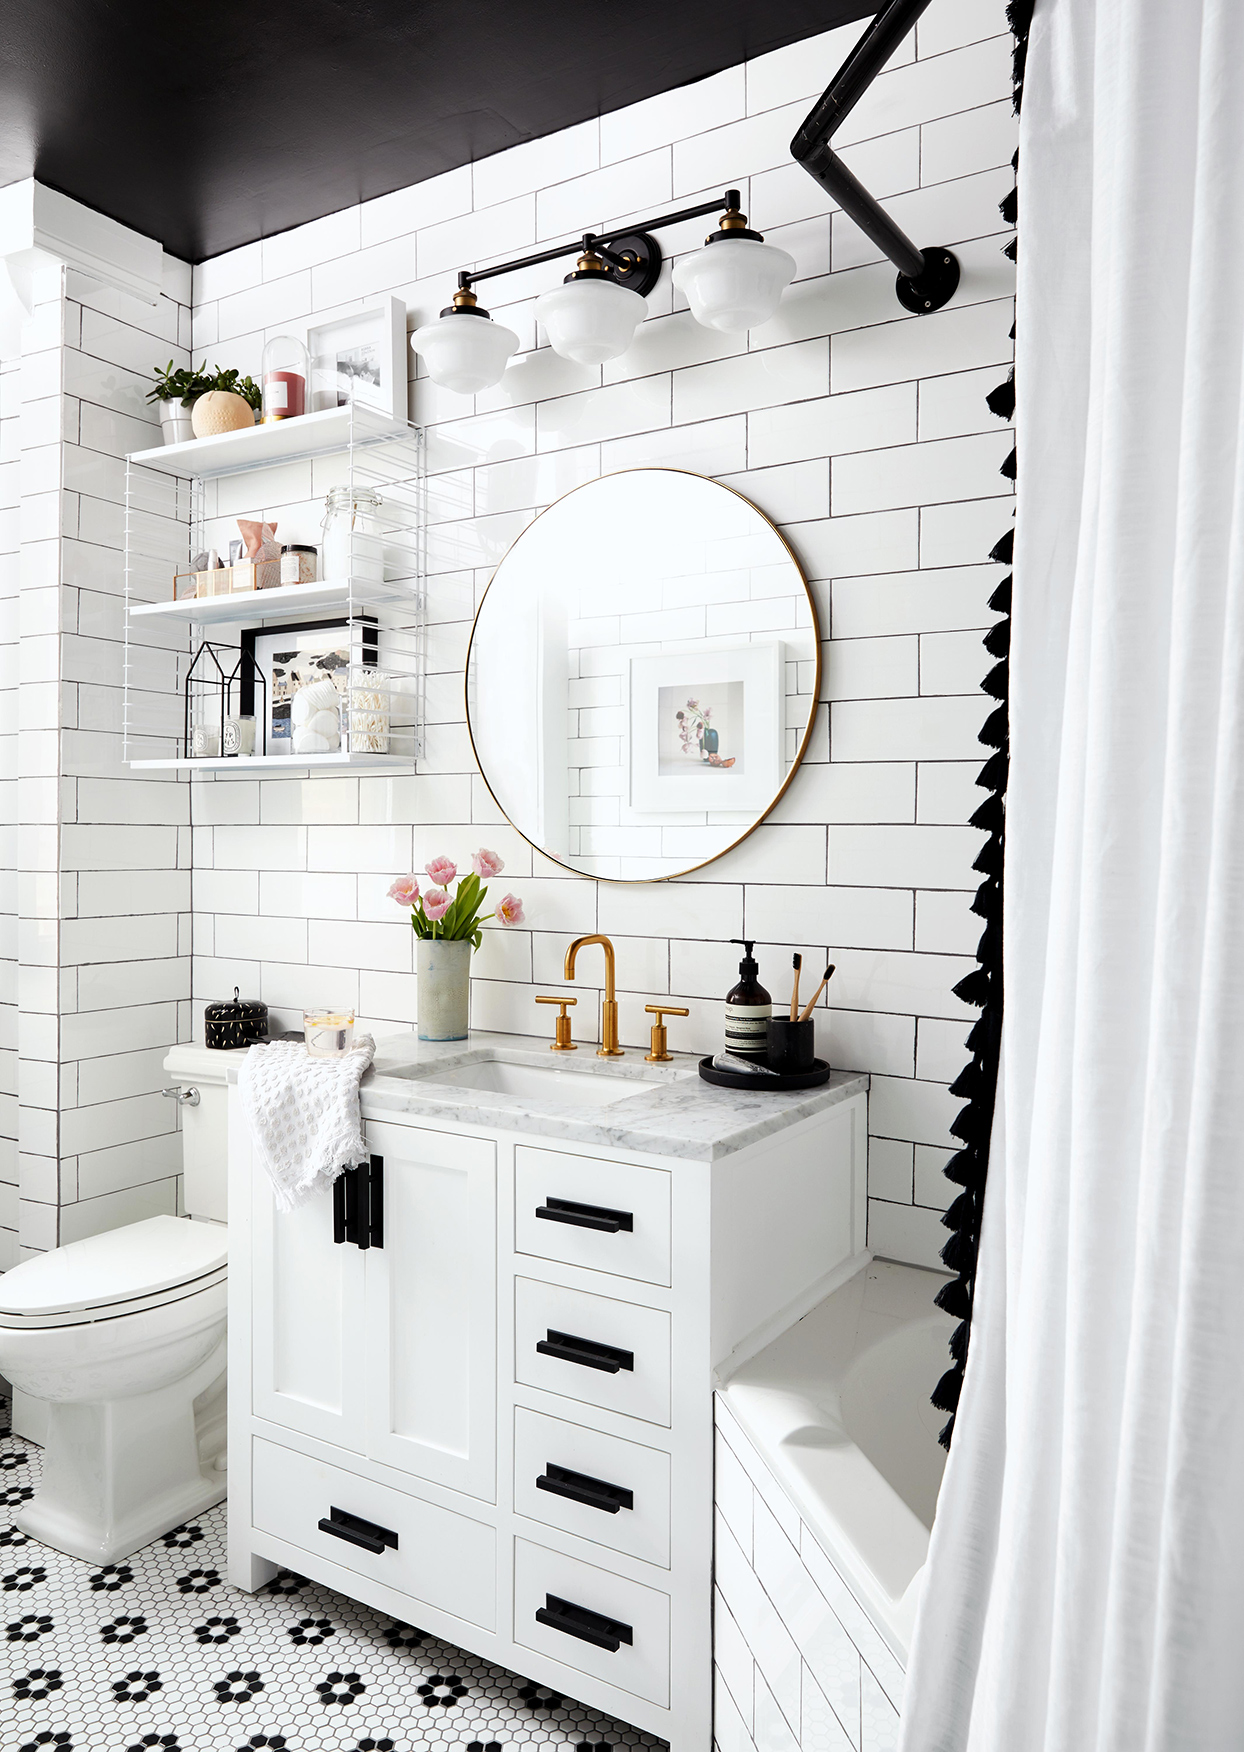 19 Small Bathroom Vanity Ideas That Pack In Plenty Of Storage Better Homes Gardens